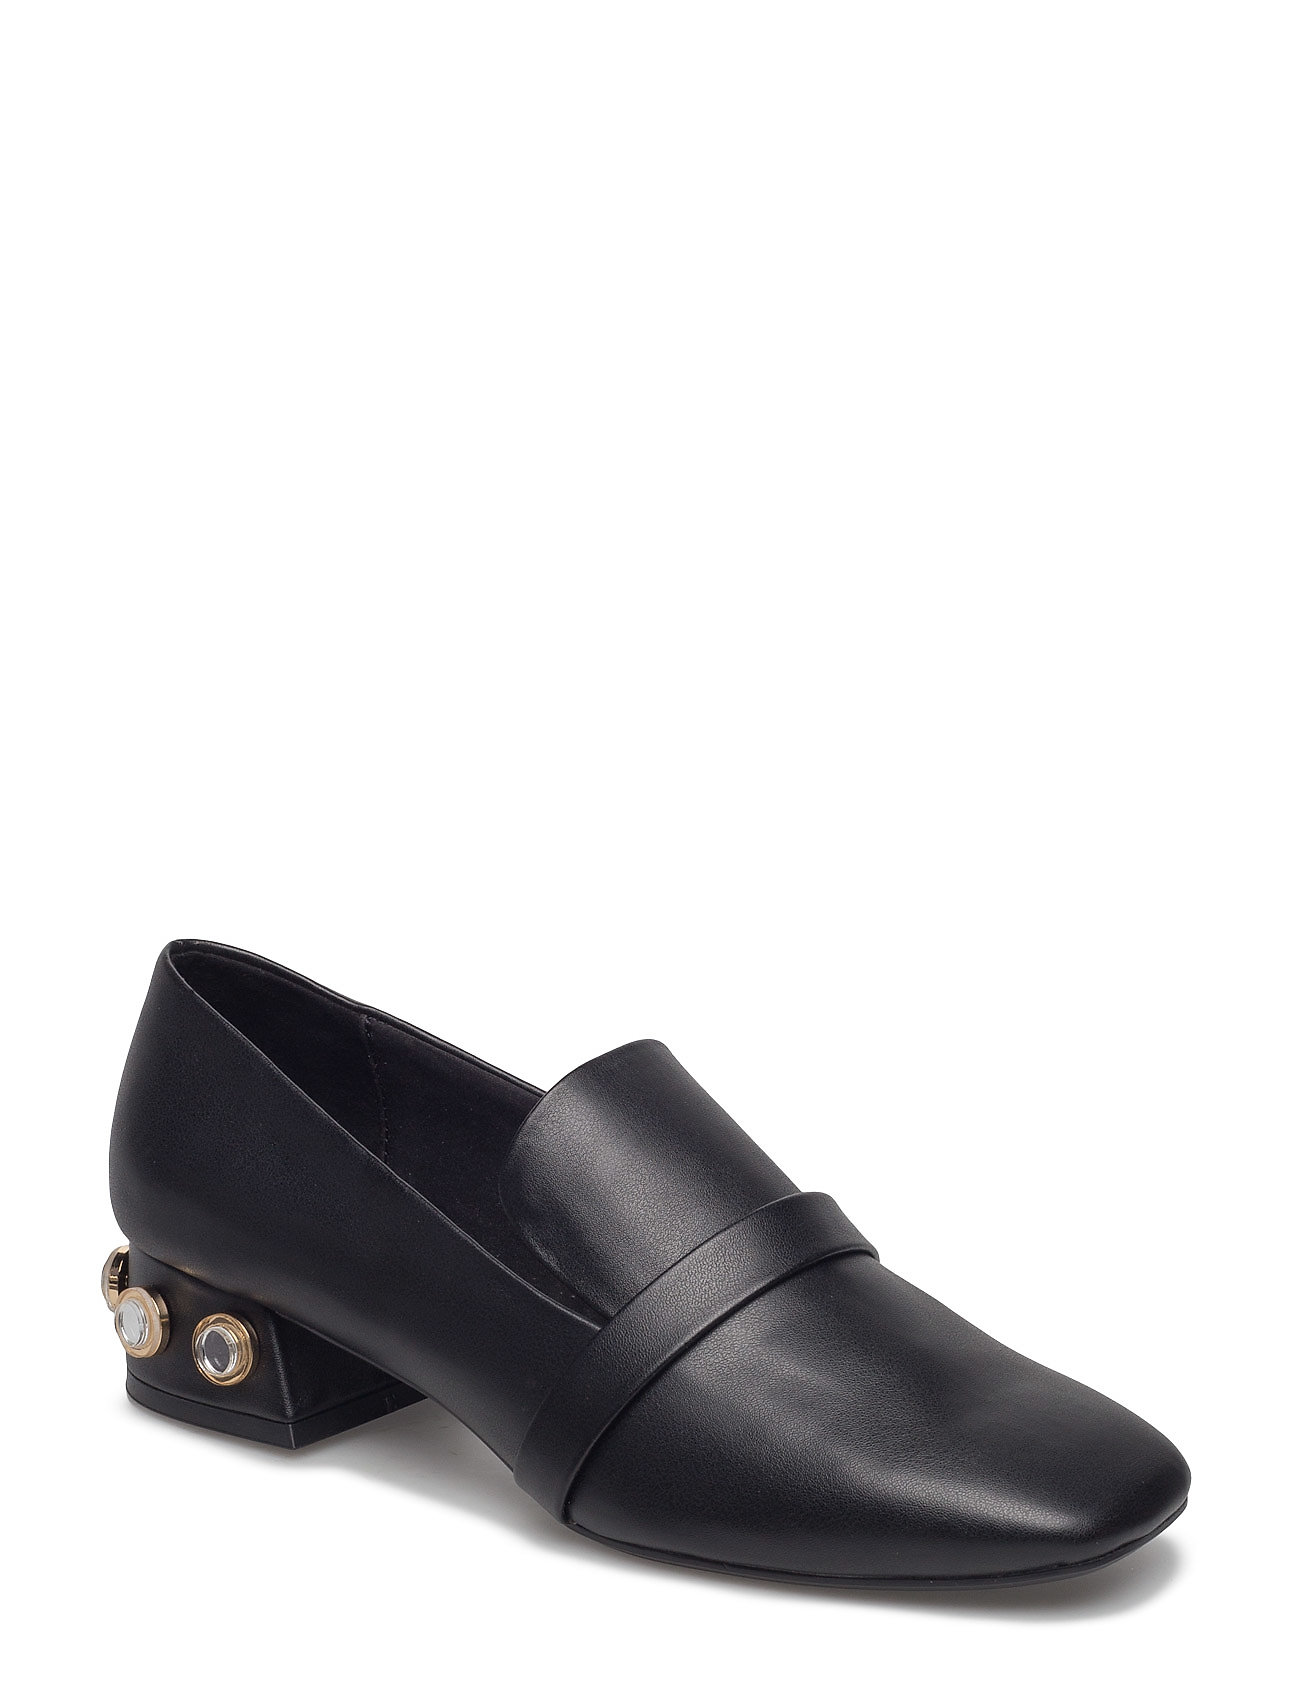 Mango Appliqu heel loafers